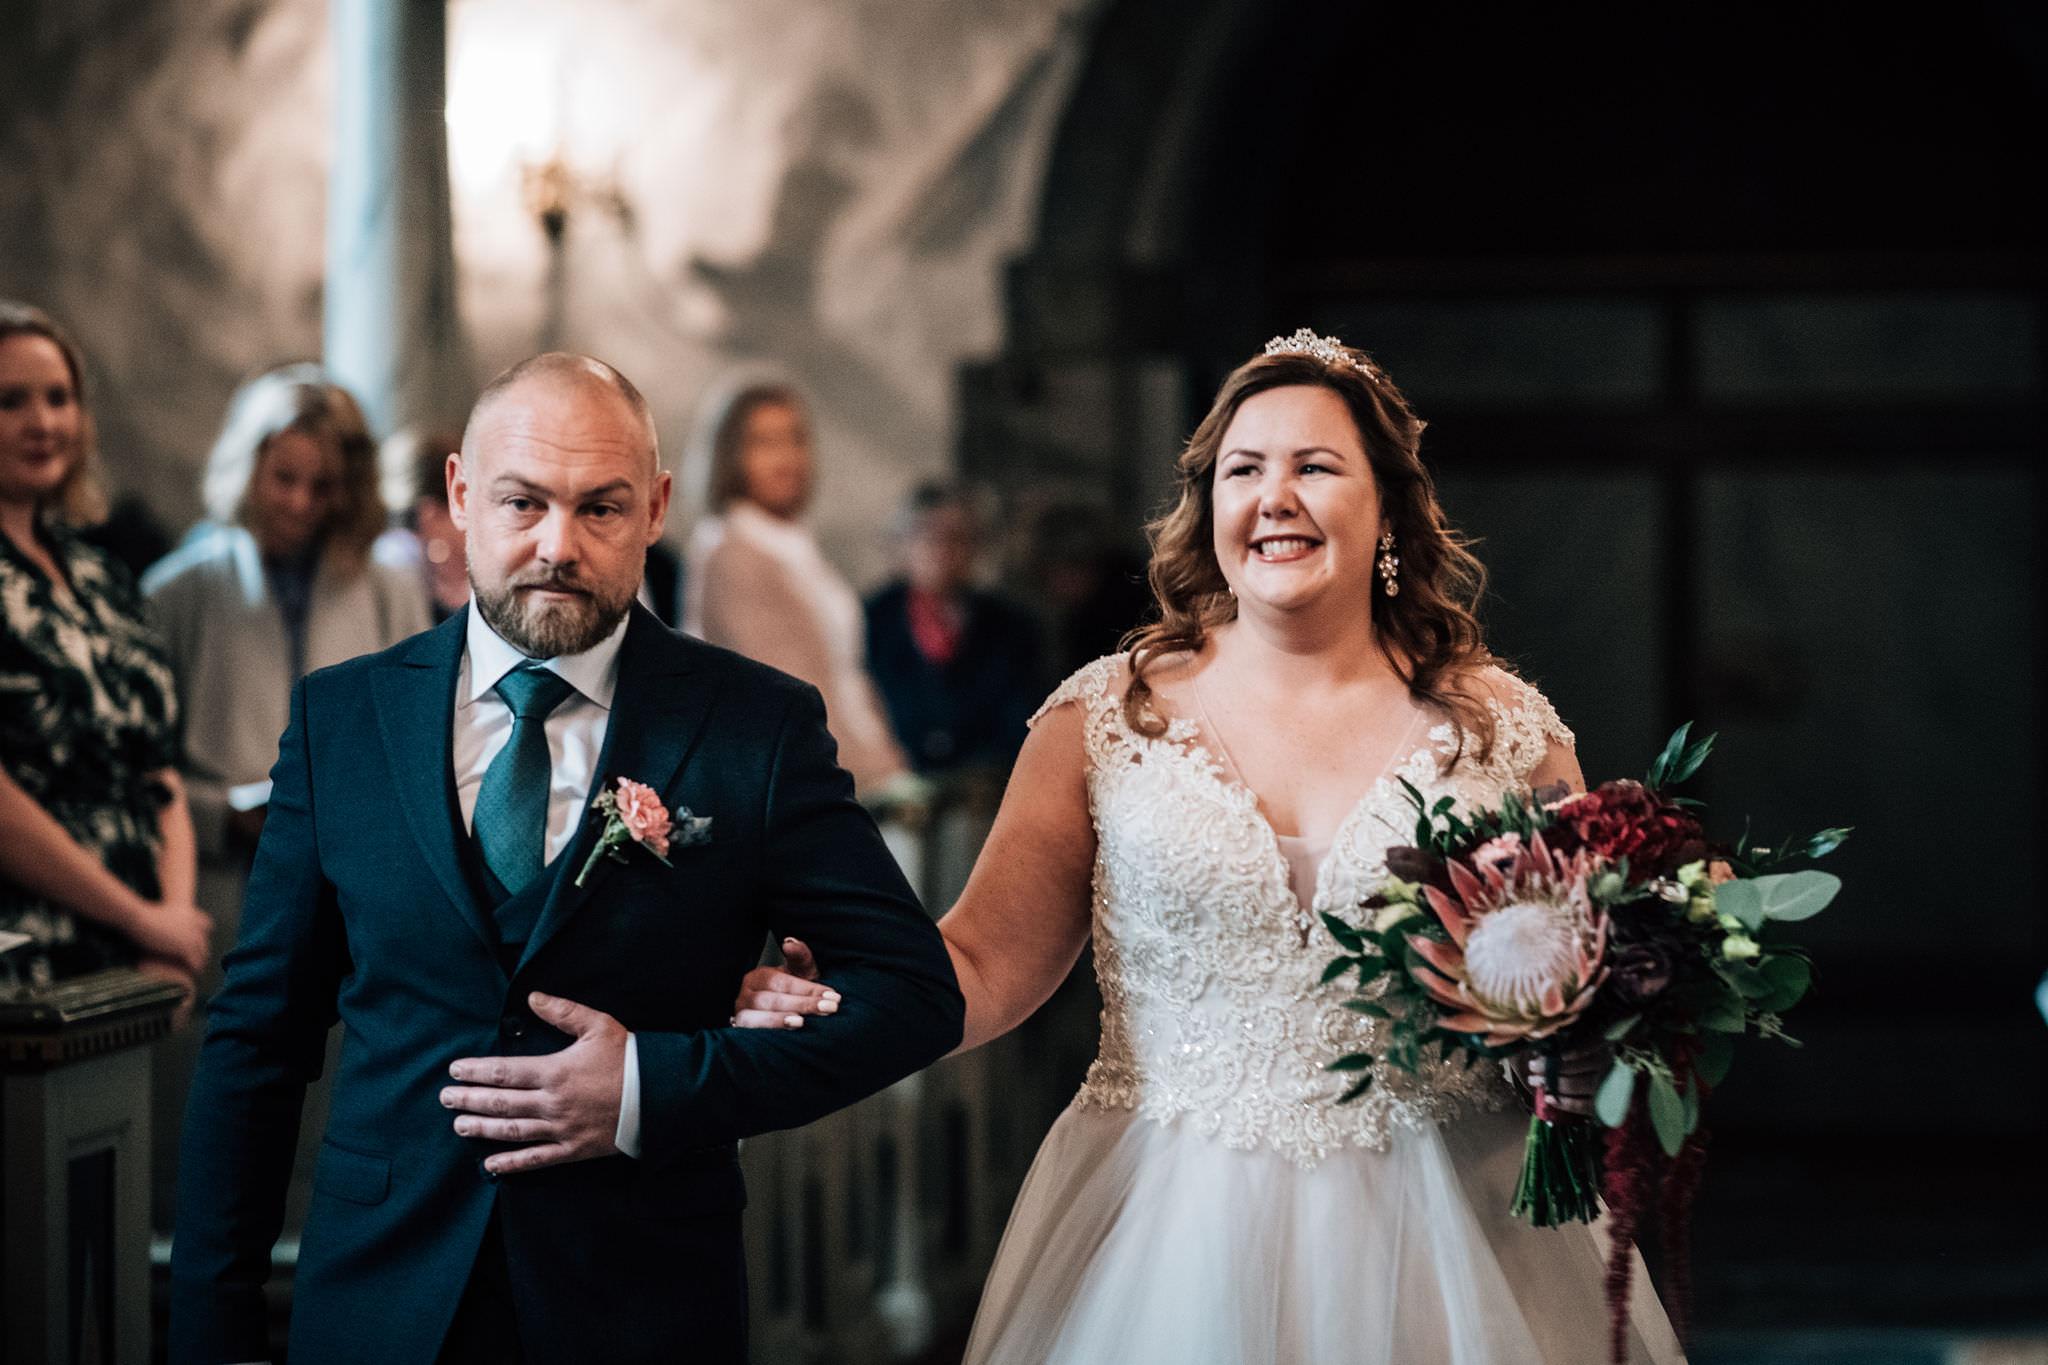 _N857660_fotografering_larvik_bryllup_aspargesgarden_.jpg